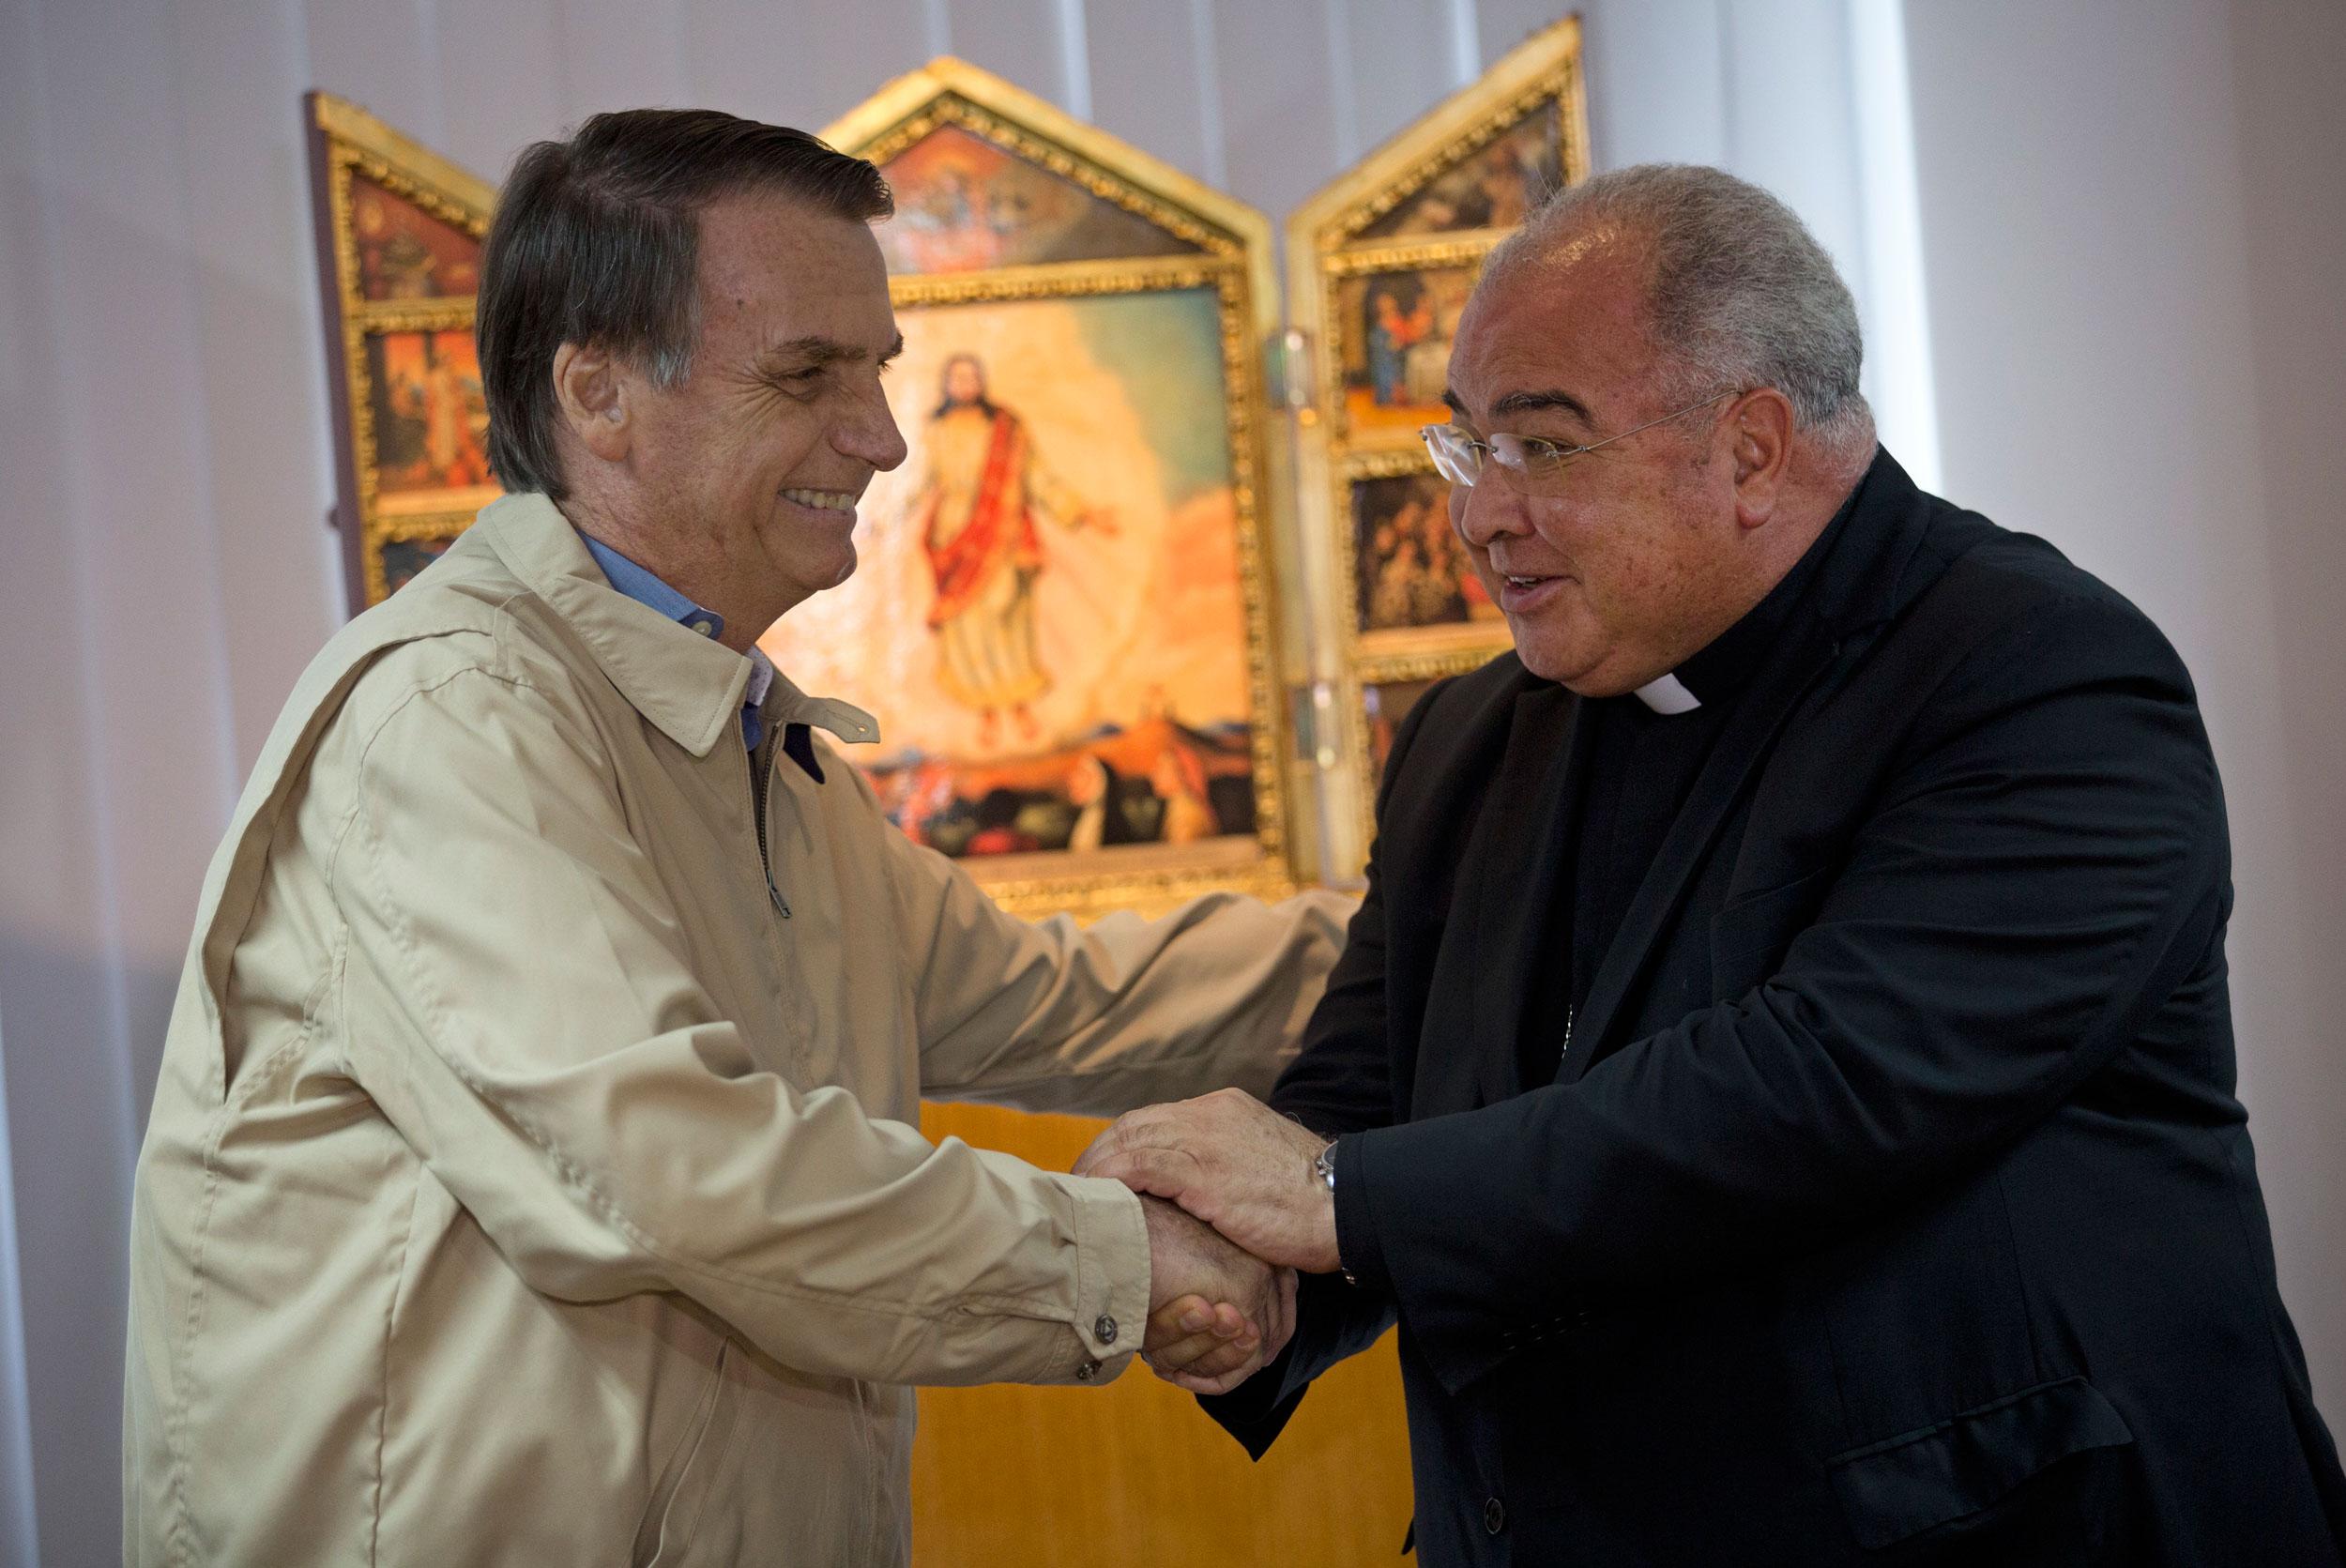 Presidential candidate Jair Bolsonaro (left) greets Rio de Janeiro's Archbishop Dom Orani Tempesta in Rio de Janeiro, Brazil, on Wednesday